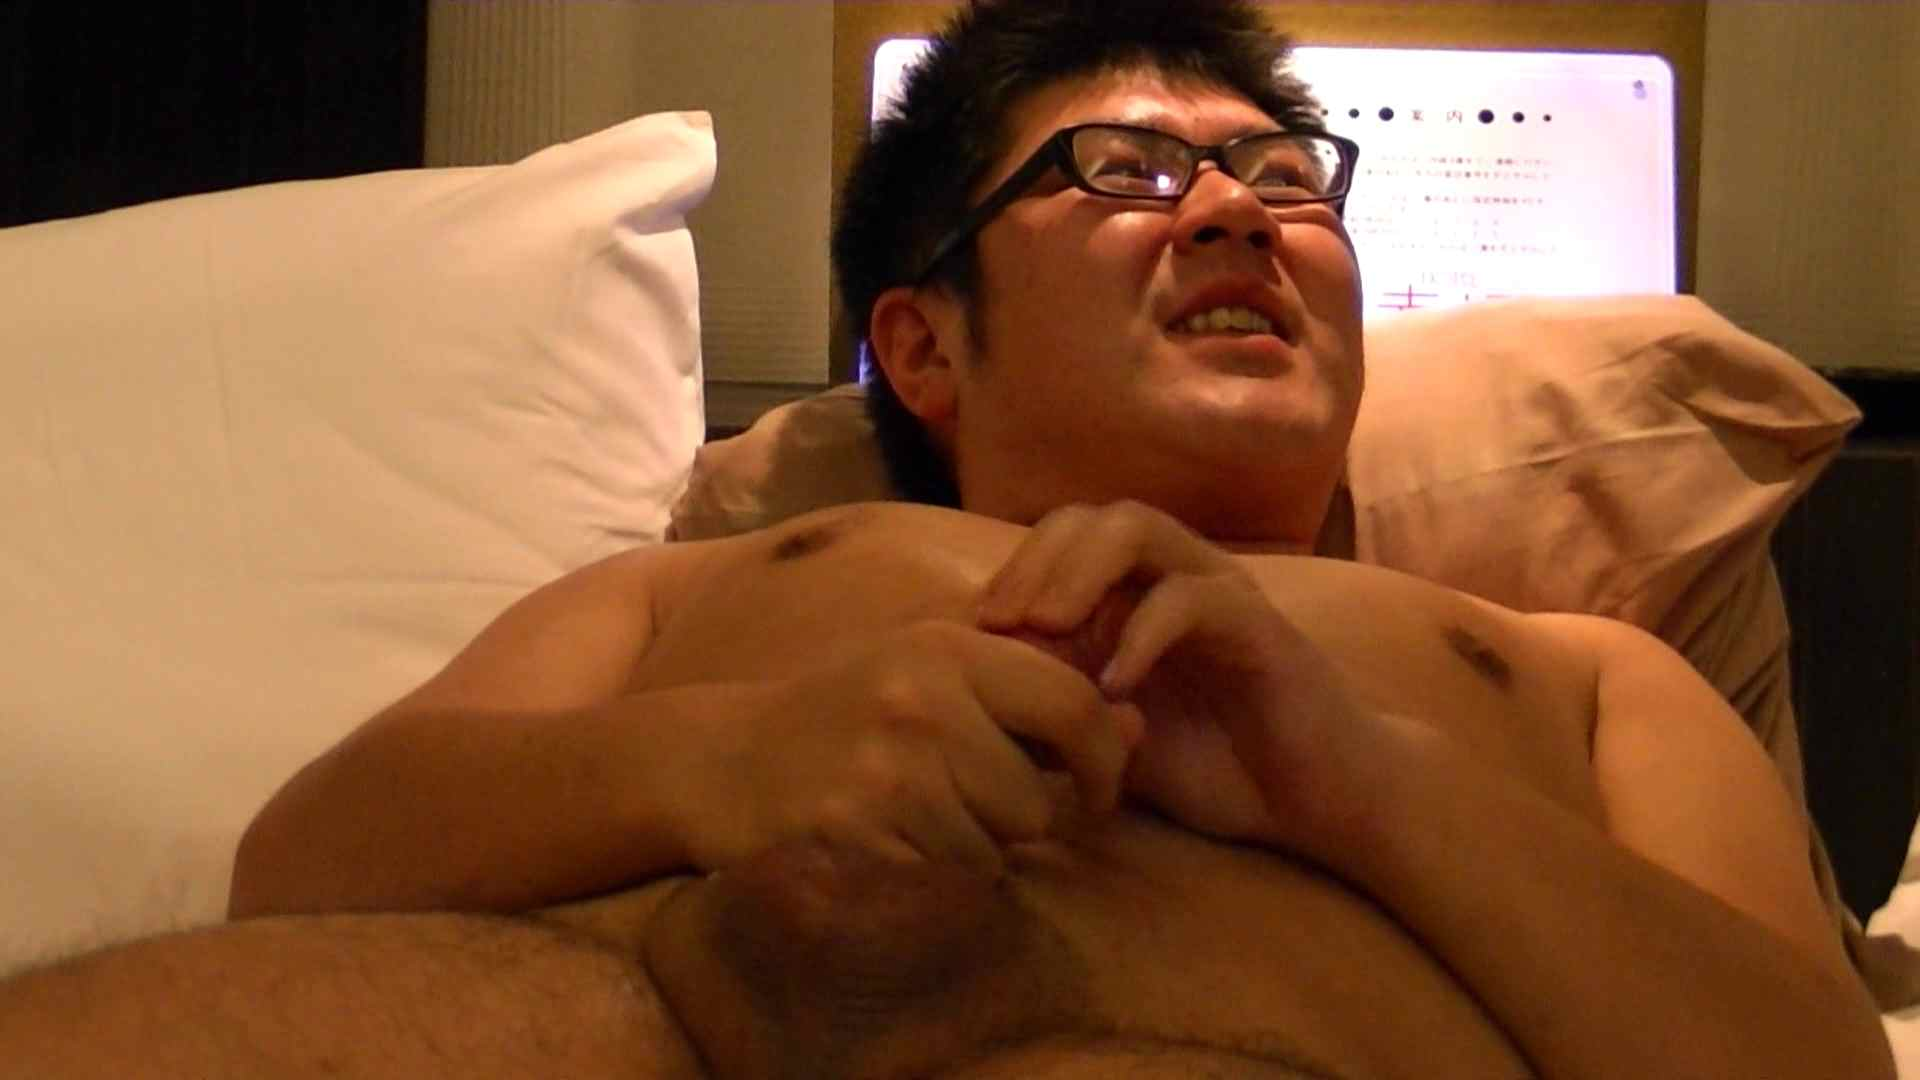 Mr.オナックスさん投稿!HD 貴方のオナニー三万円で撮影させてください。VOL.03 後編 完全無修正版  106枚 102